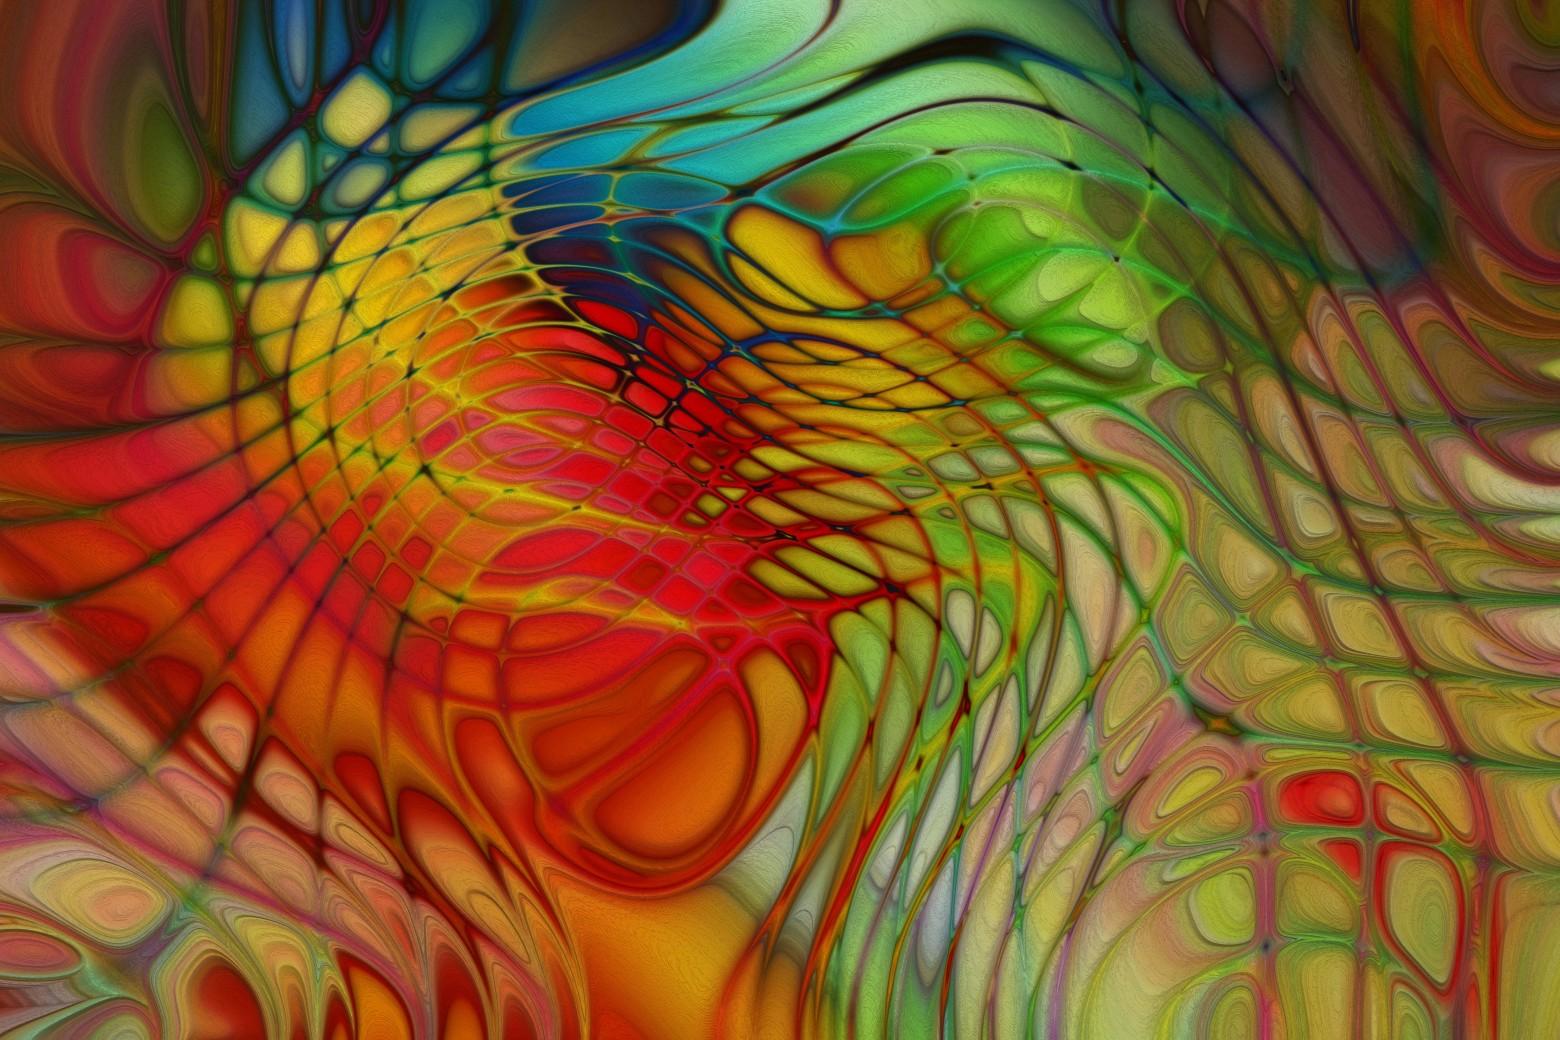 fotomelia free images download public domain